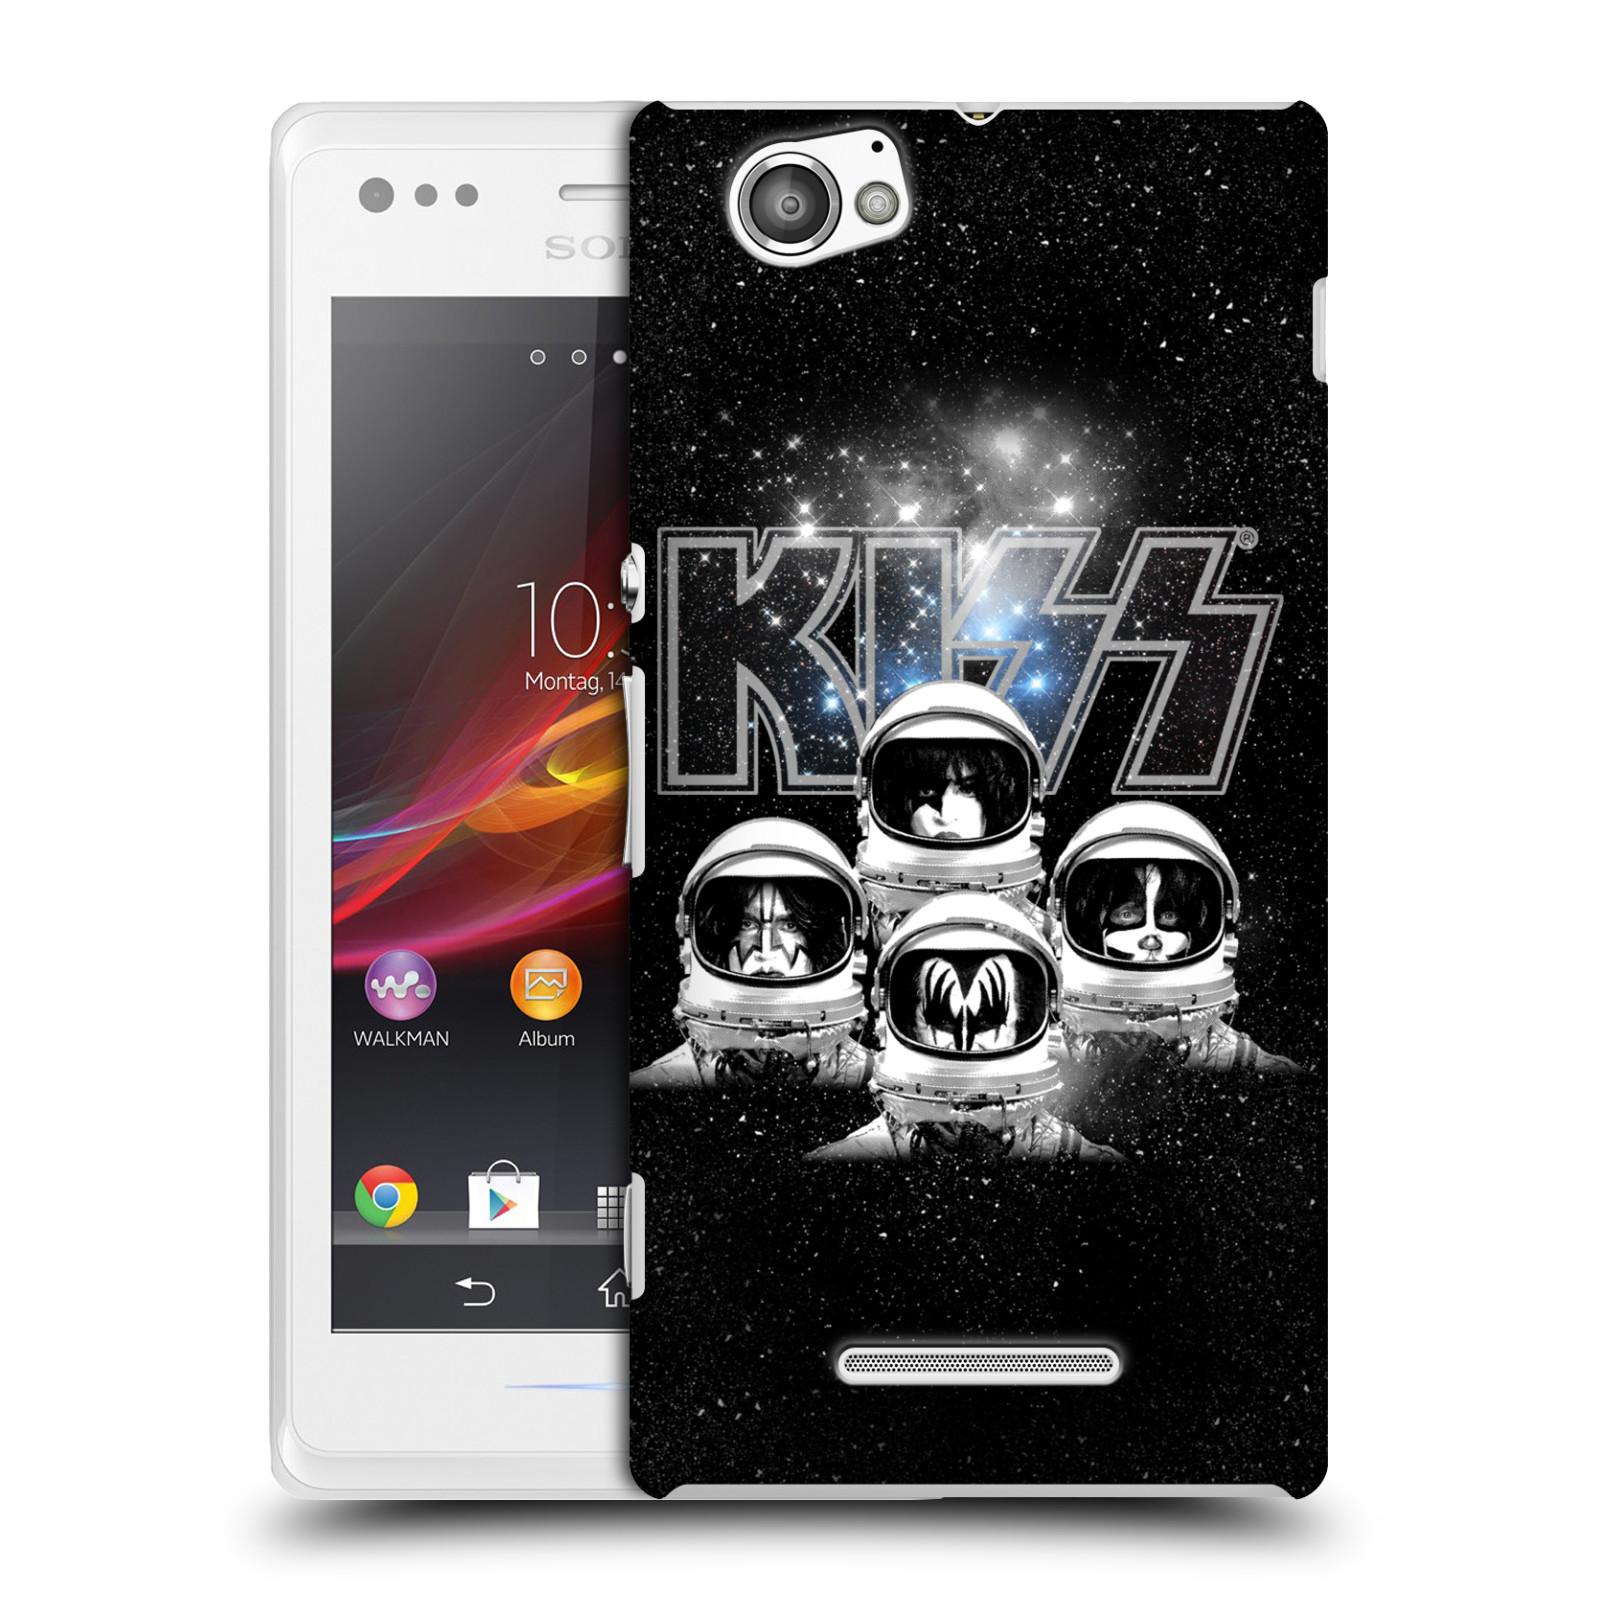 Plastové pouzdro na mobil Sony Xperia M C1905 HEAD CASE - Kiss - Galactic (Plastový kryt či obal na mobilní telefon s licencovaným motivem Kiss pro Sony Xperia M )